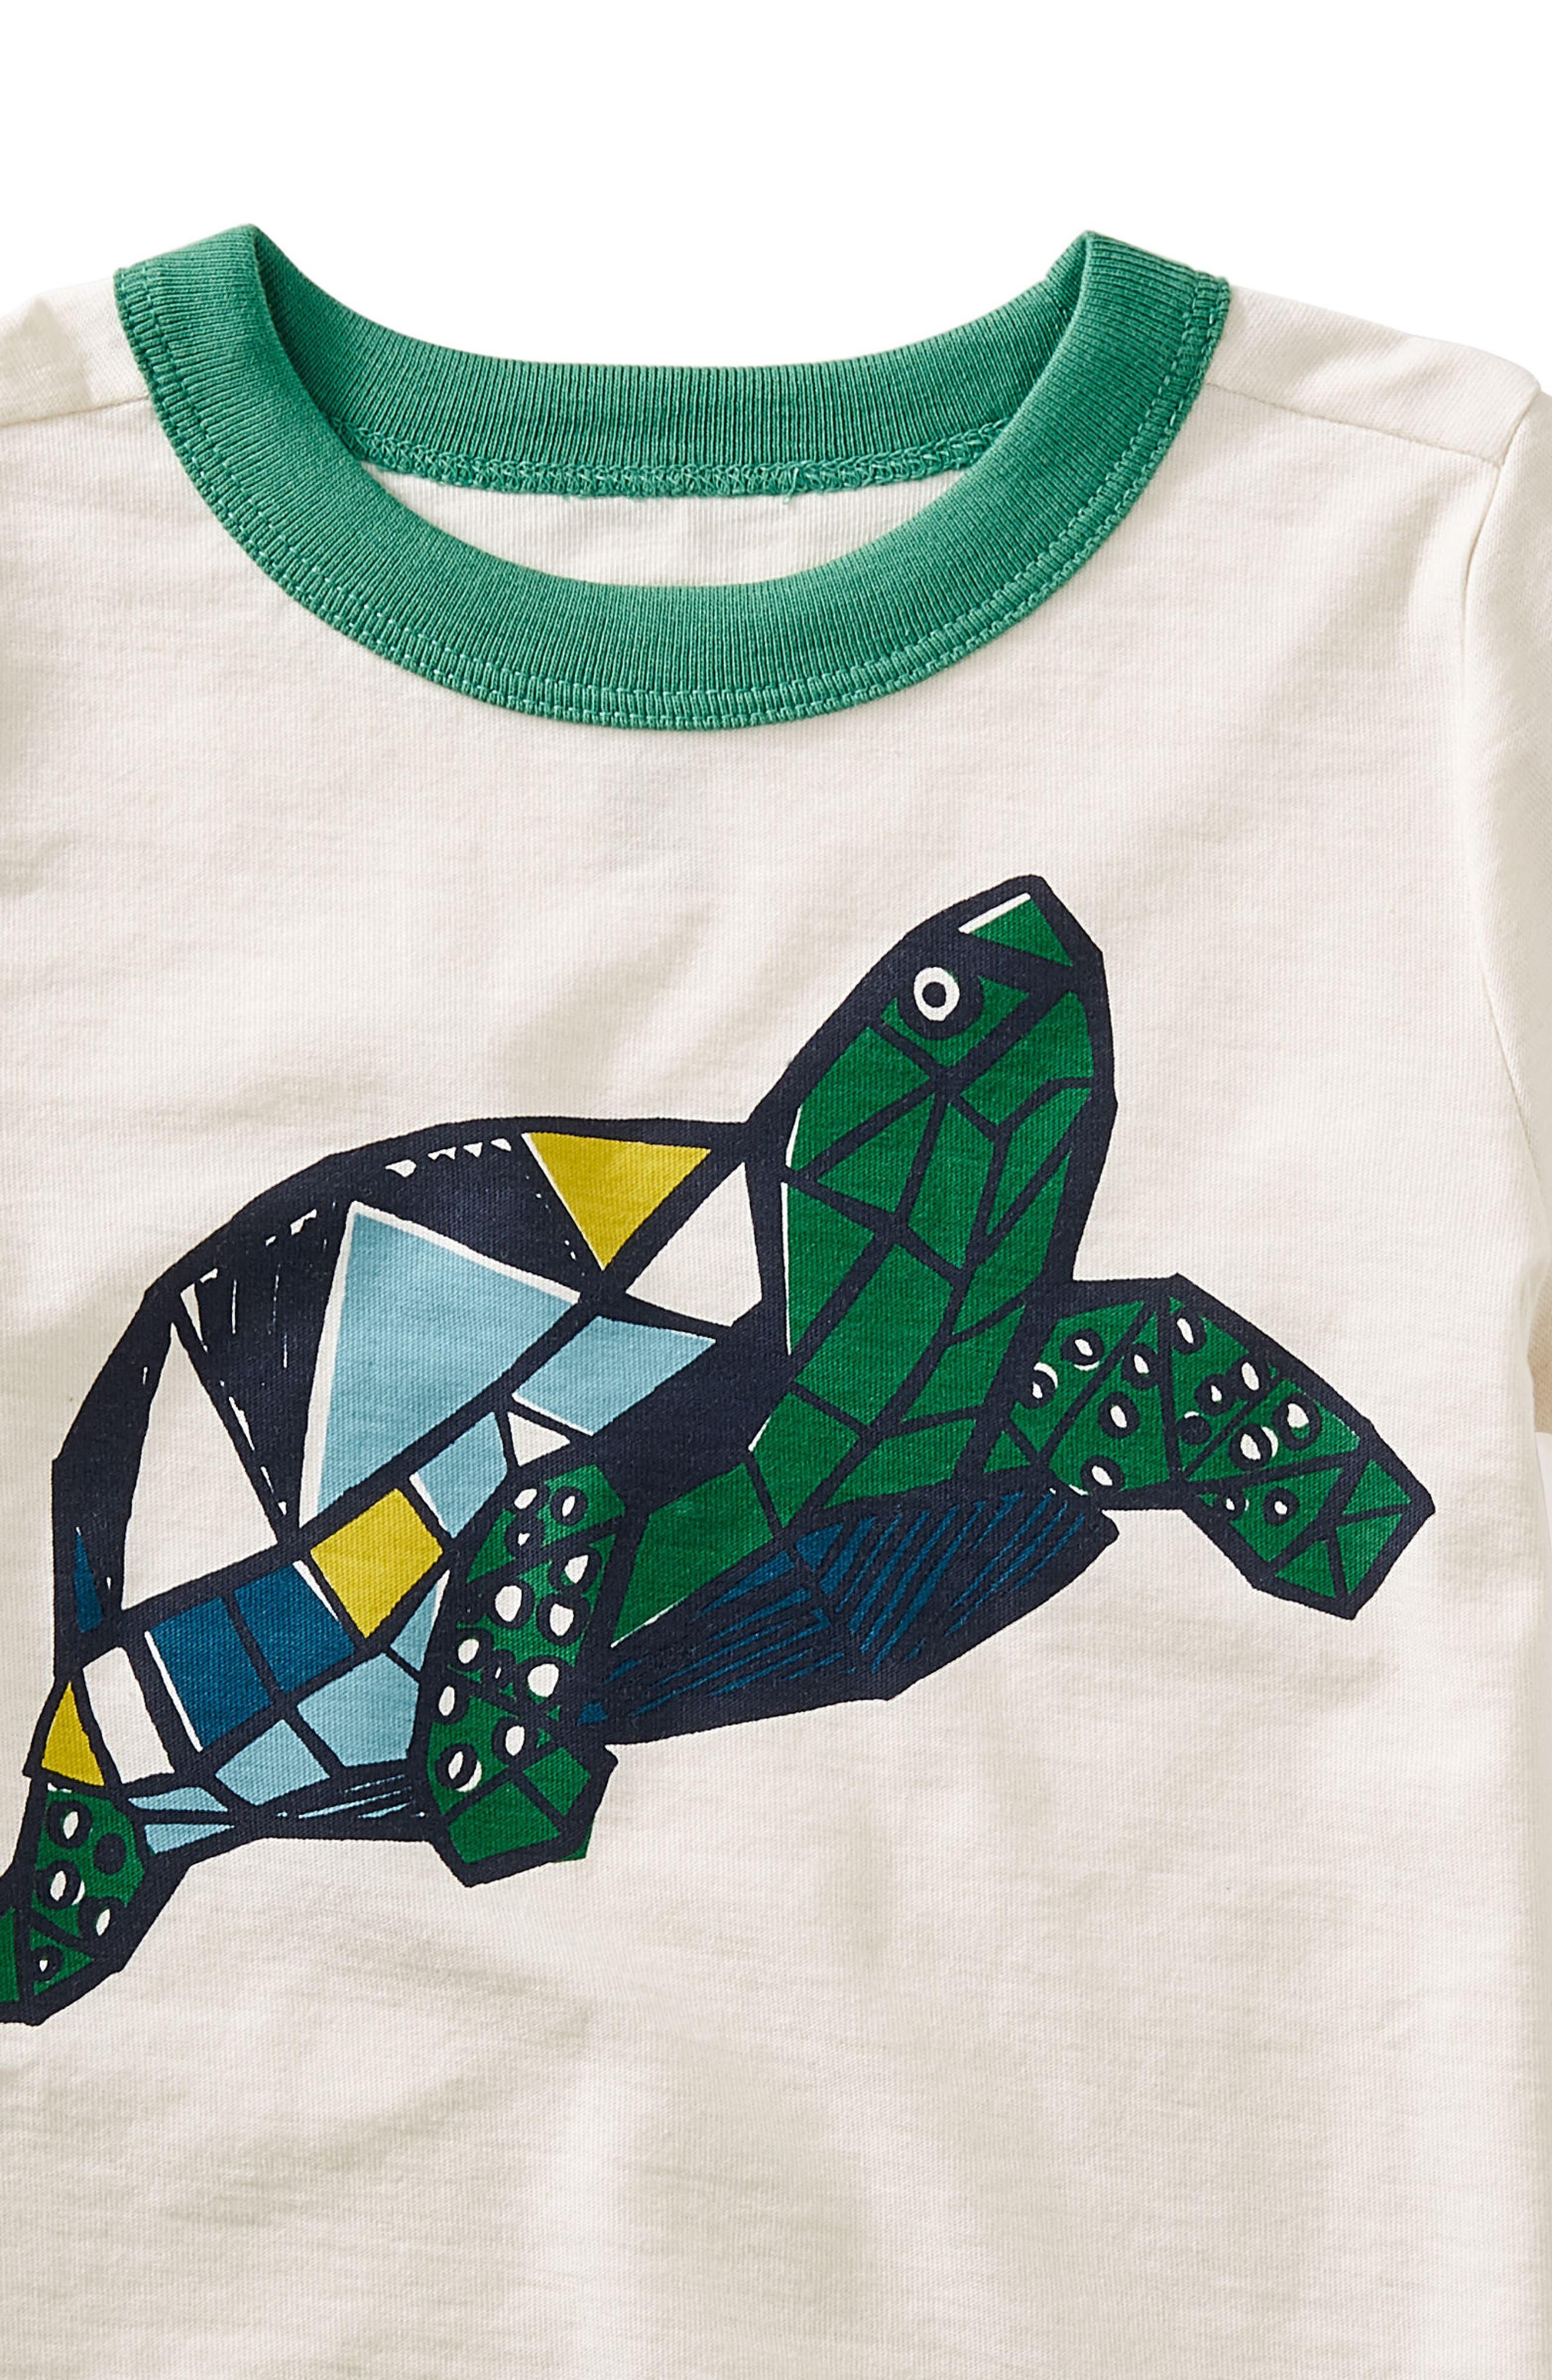 Turtle Power T-Shirt,                             Alternate thumbnail 2, color,